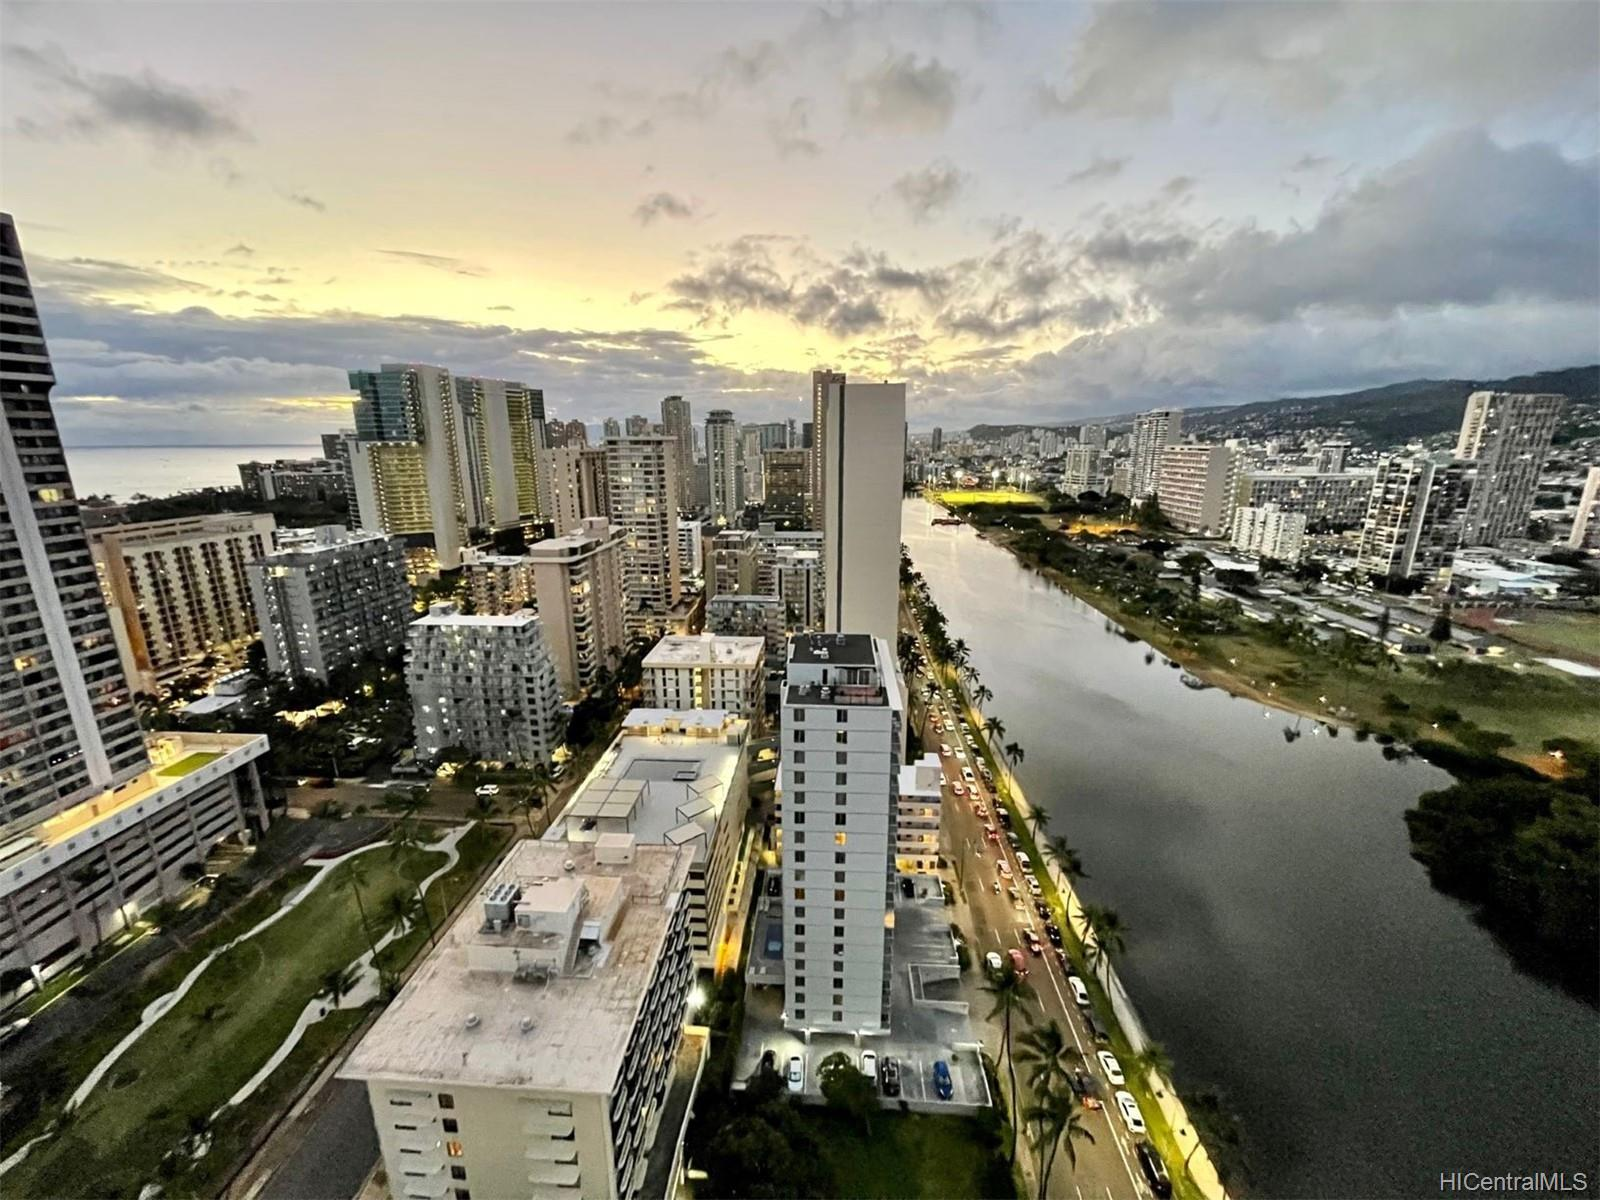 Island Colony condo MLS 202112798